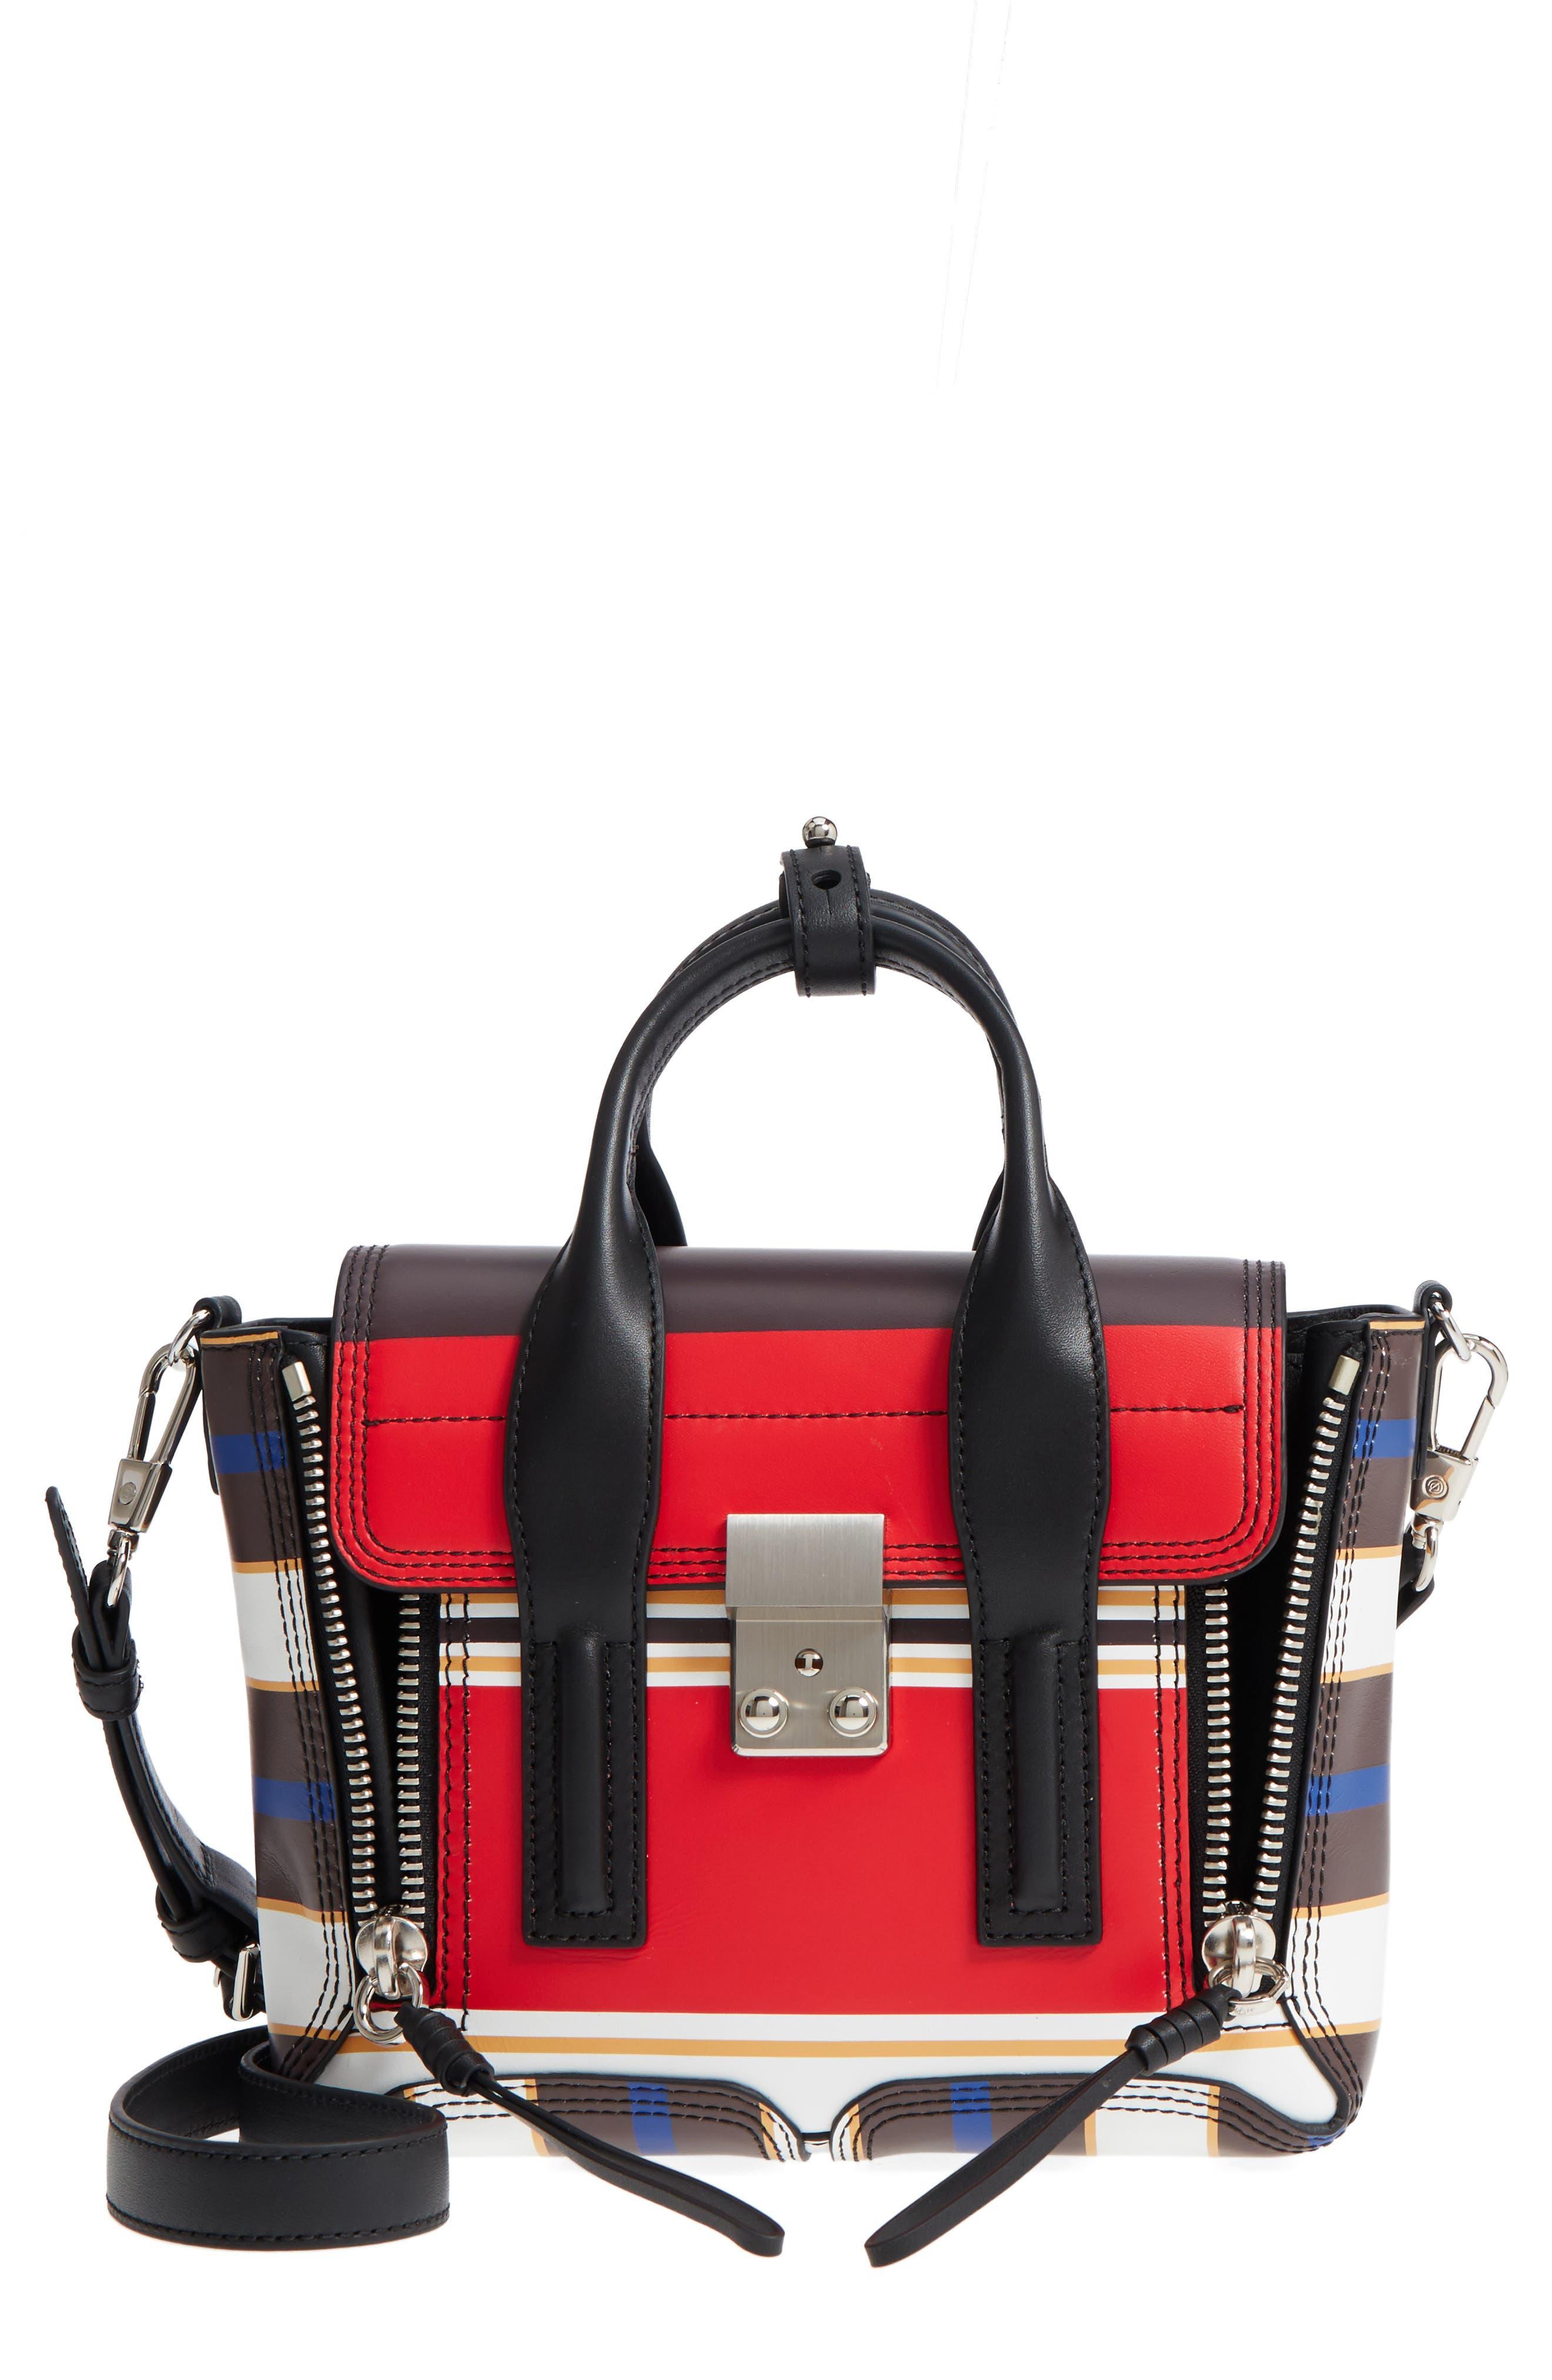 3.1 Phillip Lim Mini Pashli Stripe Leather Satchel